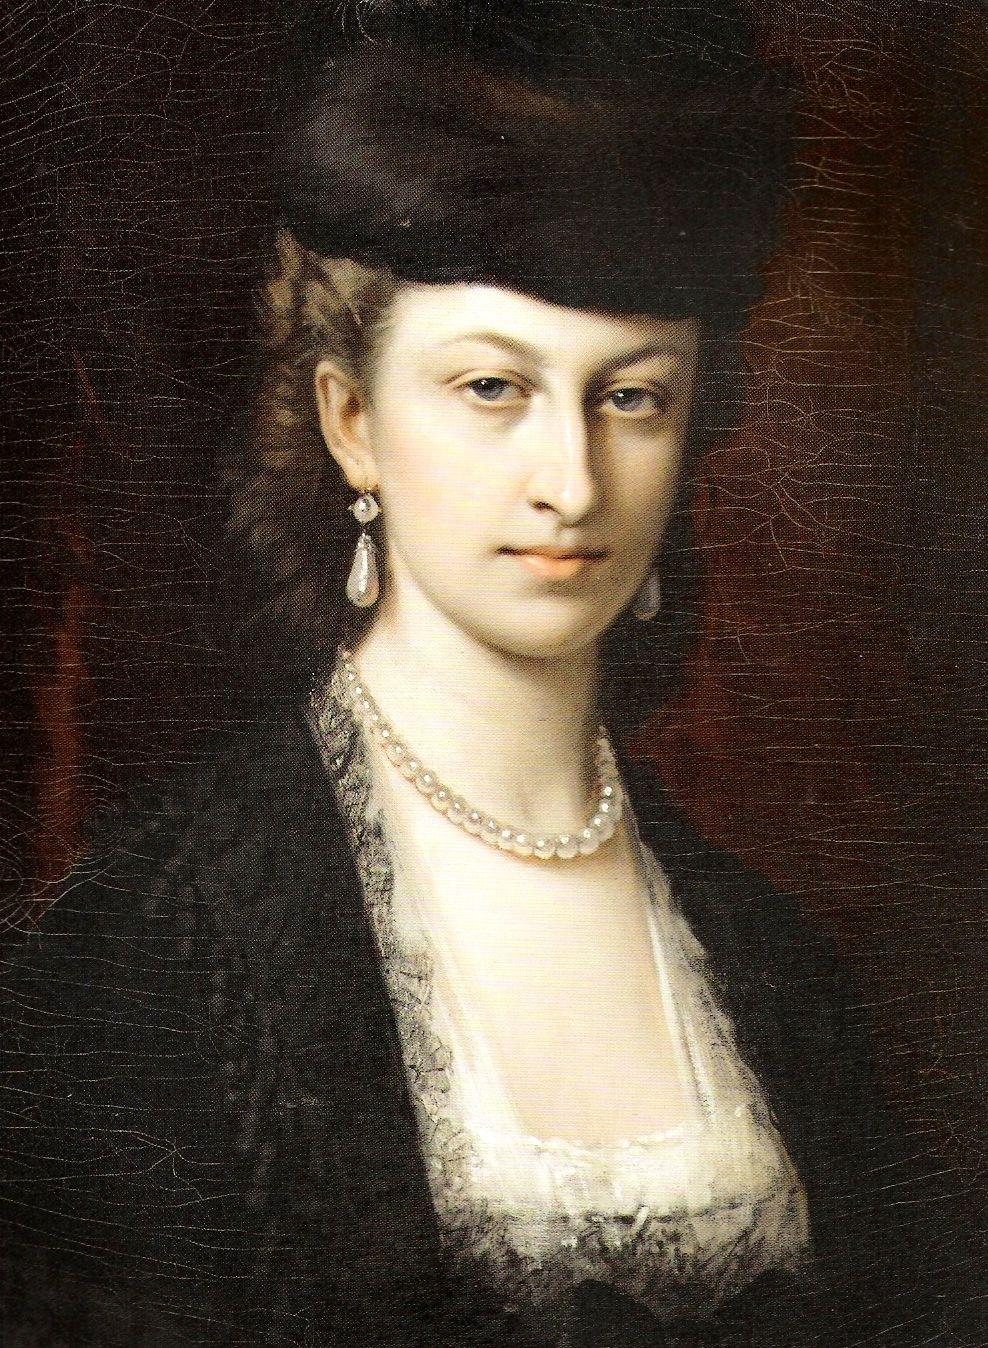 Portrait of Róża Maria Augusta Tarnowska (Polish noblewoman,1854-1942) by Leopold Gasser